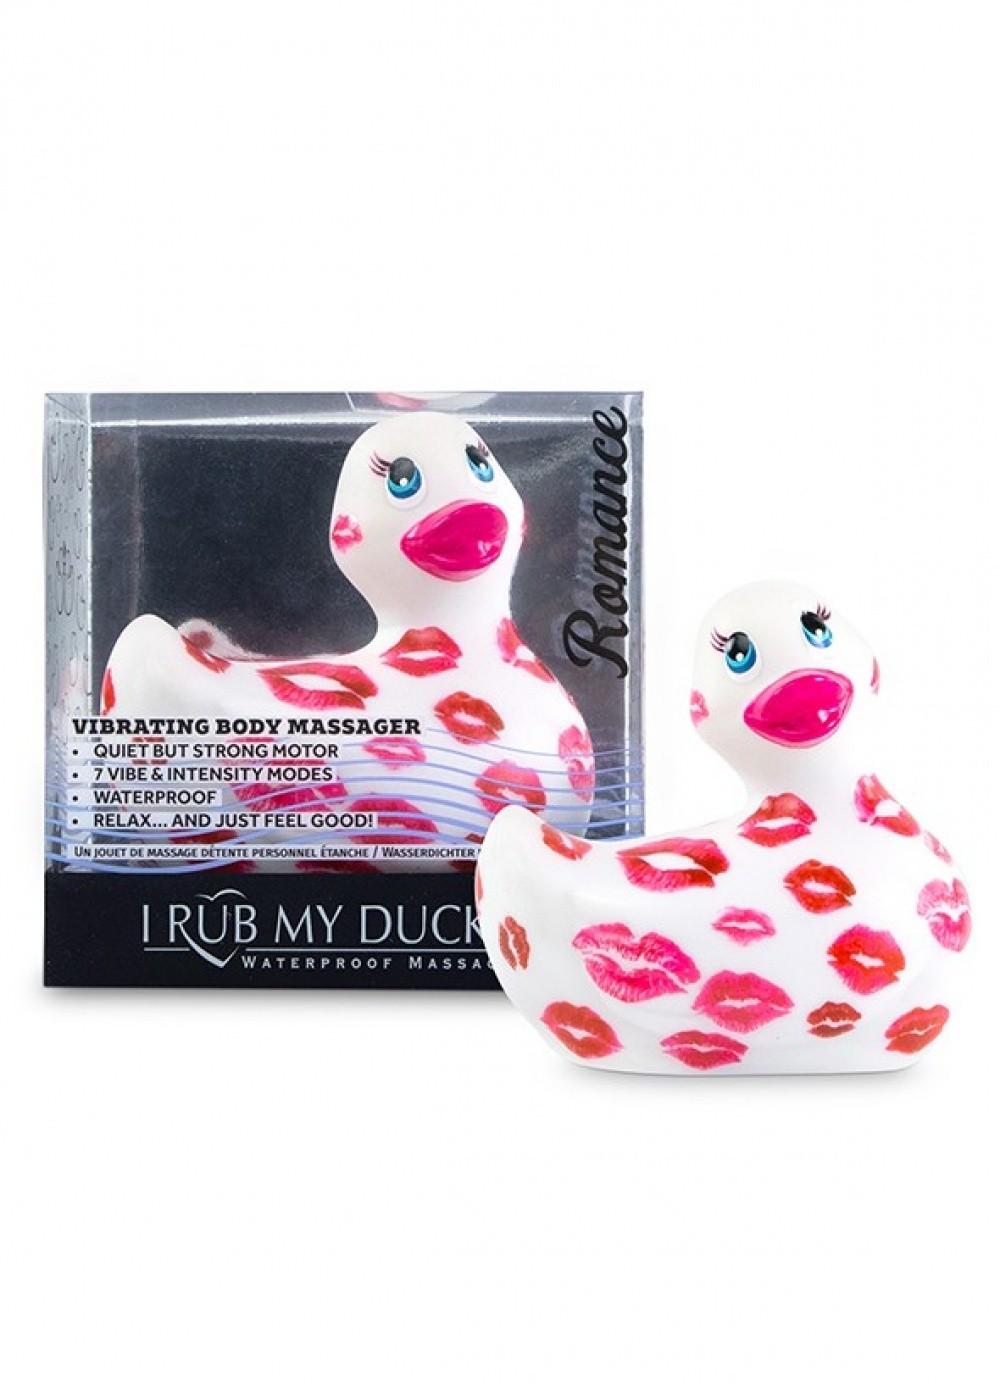 Canard mini duckie 2.0 Romance bisous